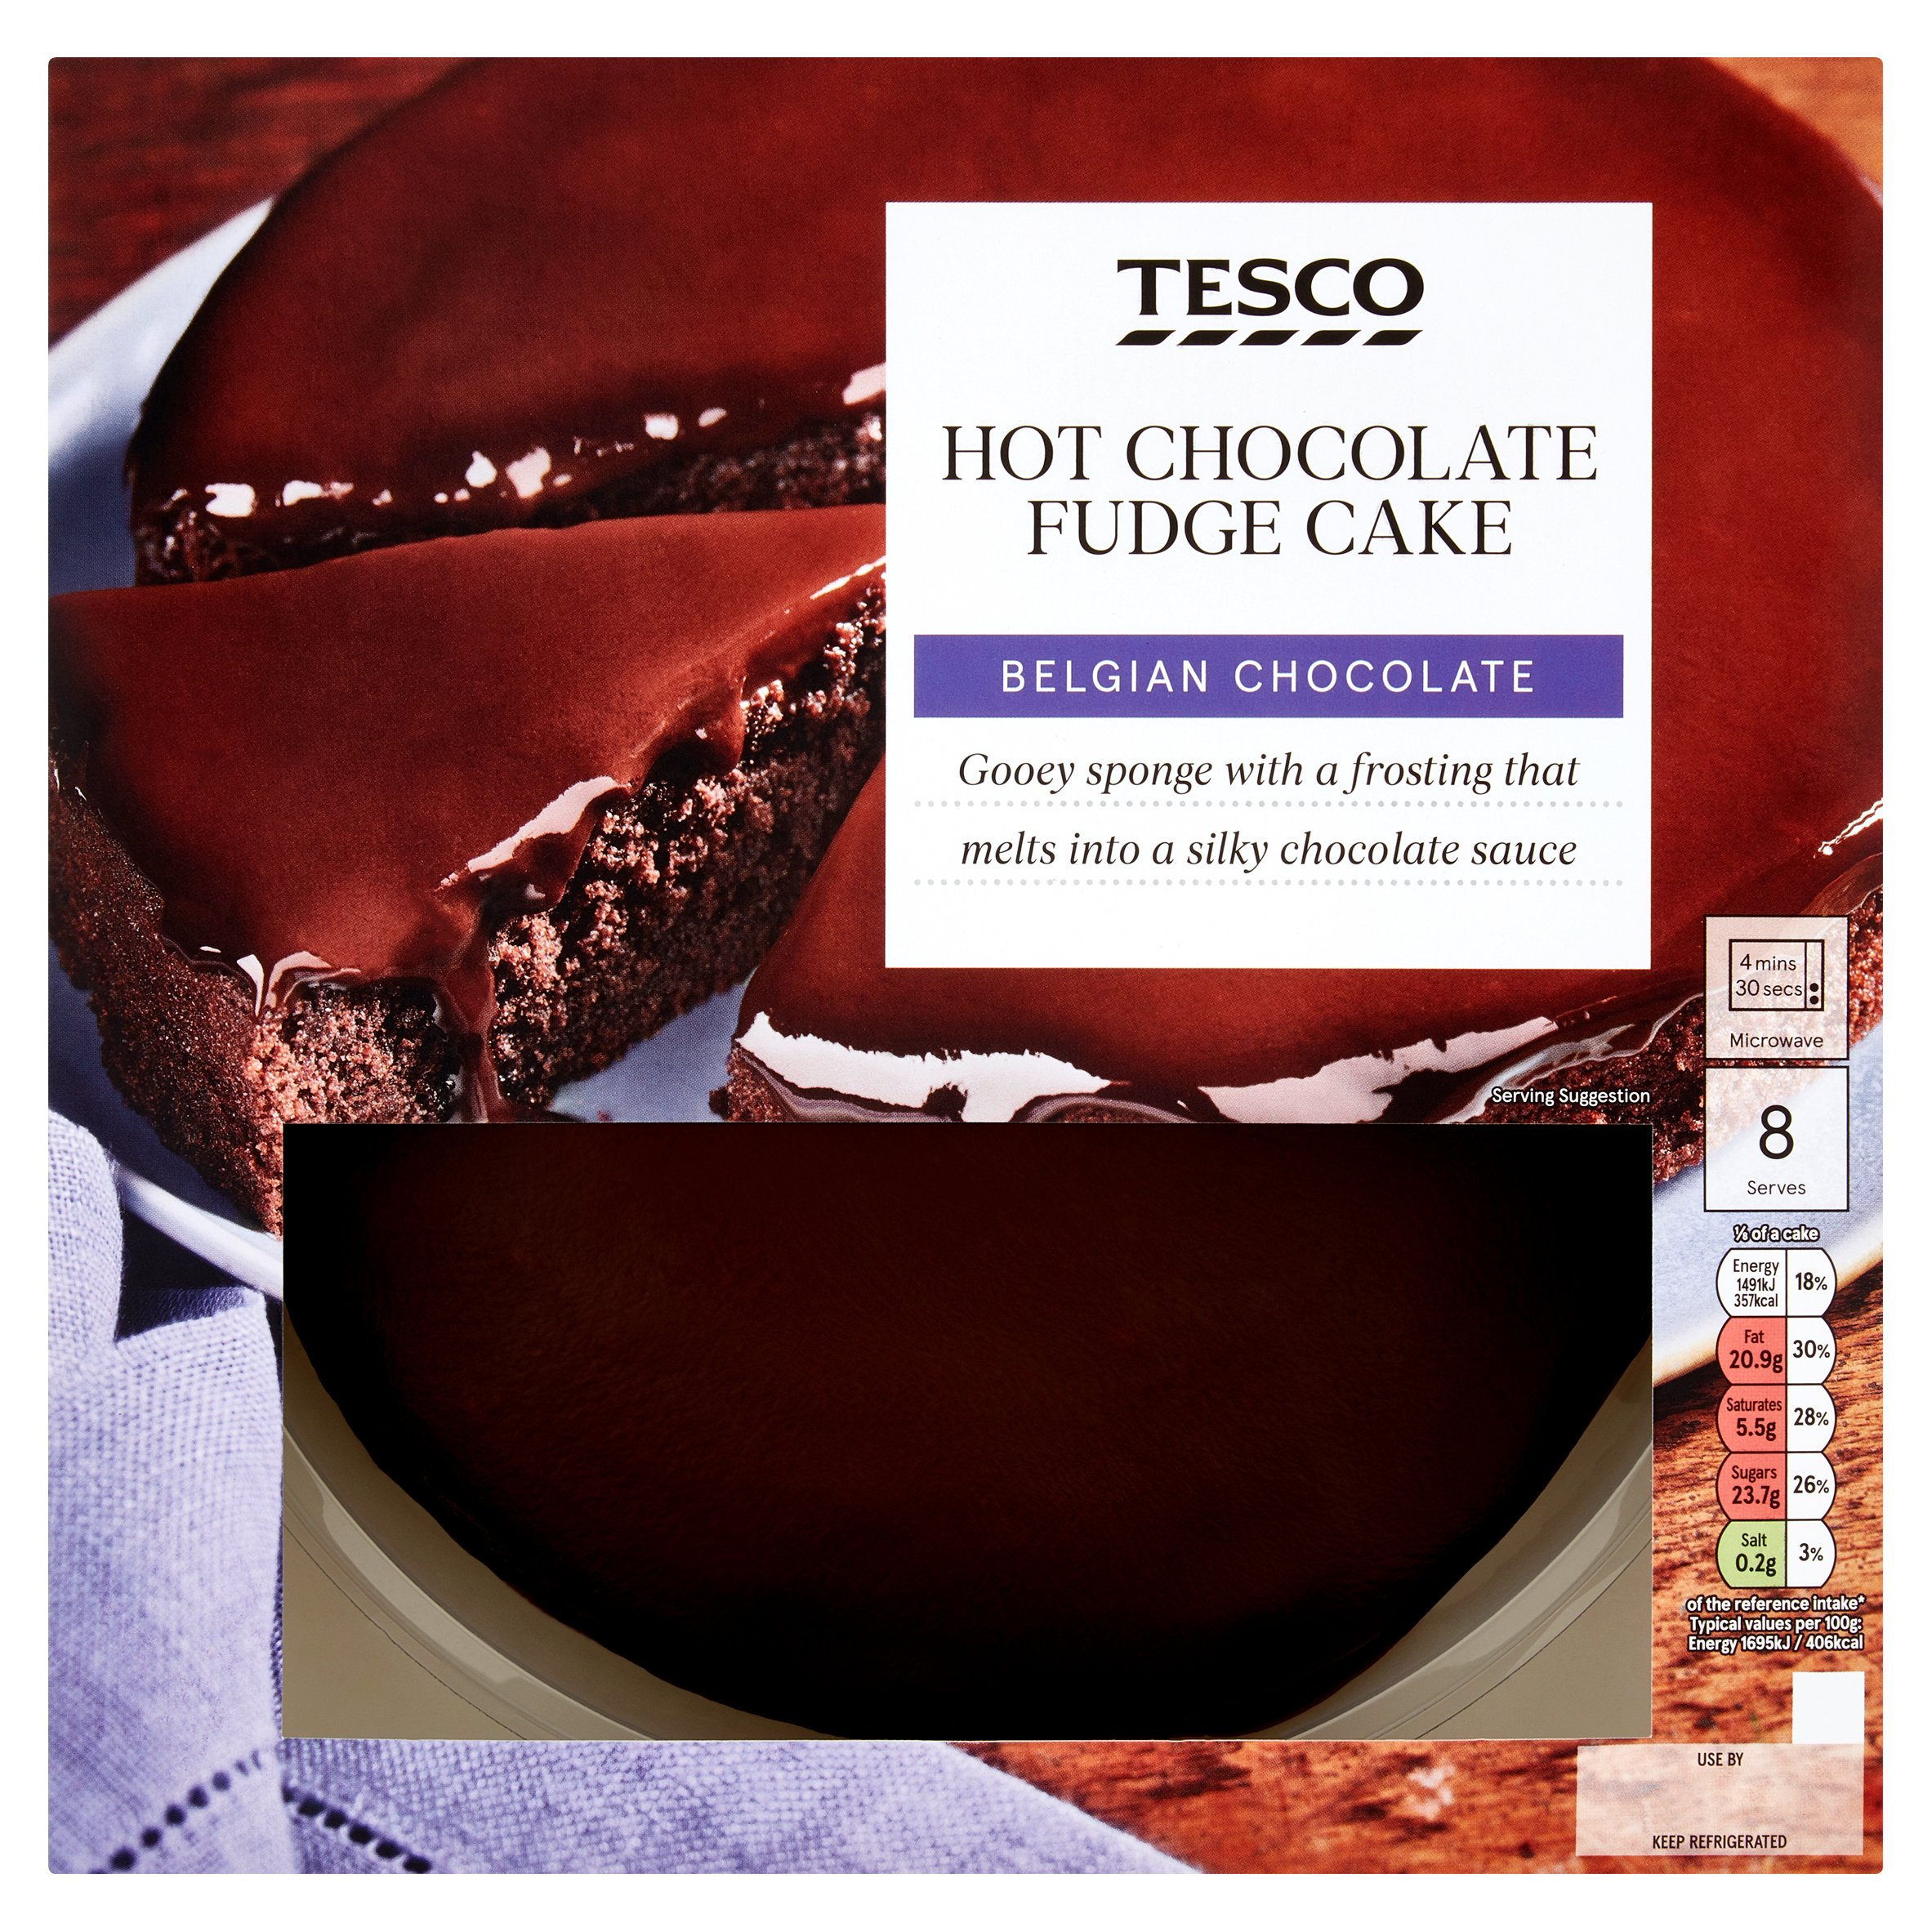 Tesco Hot Chocolate Fudge Cake 700G